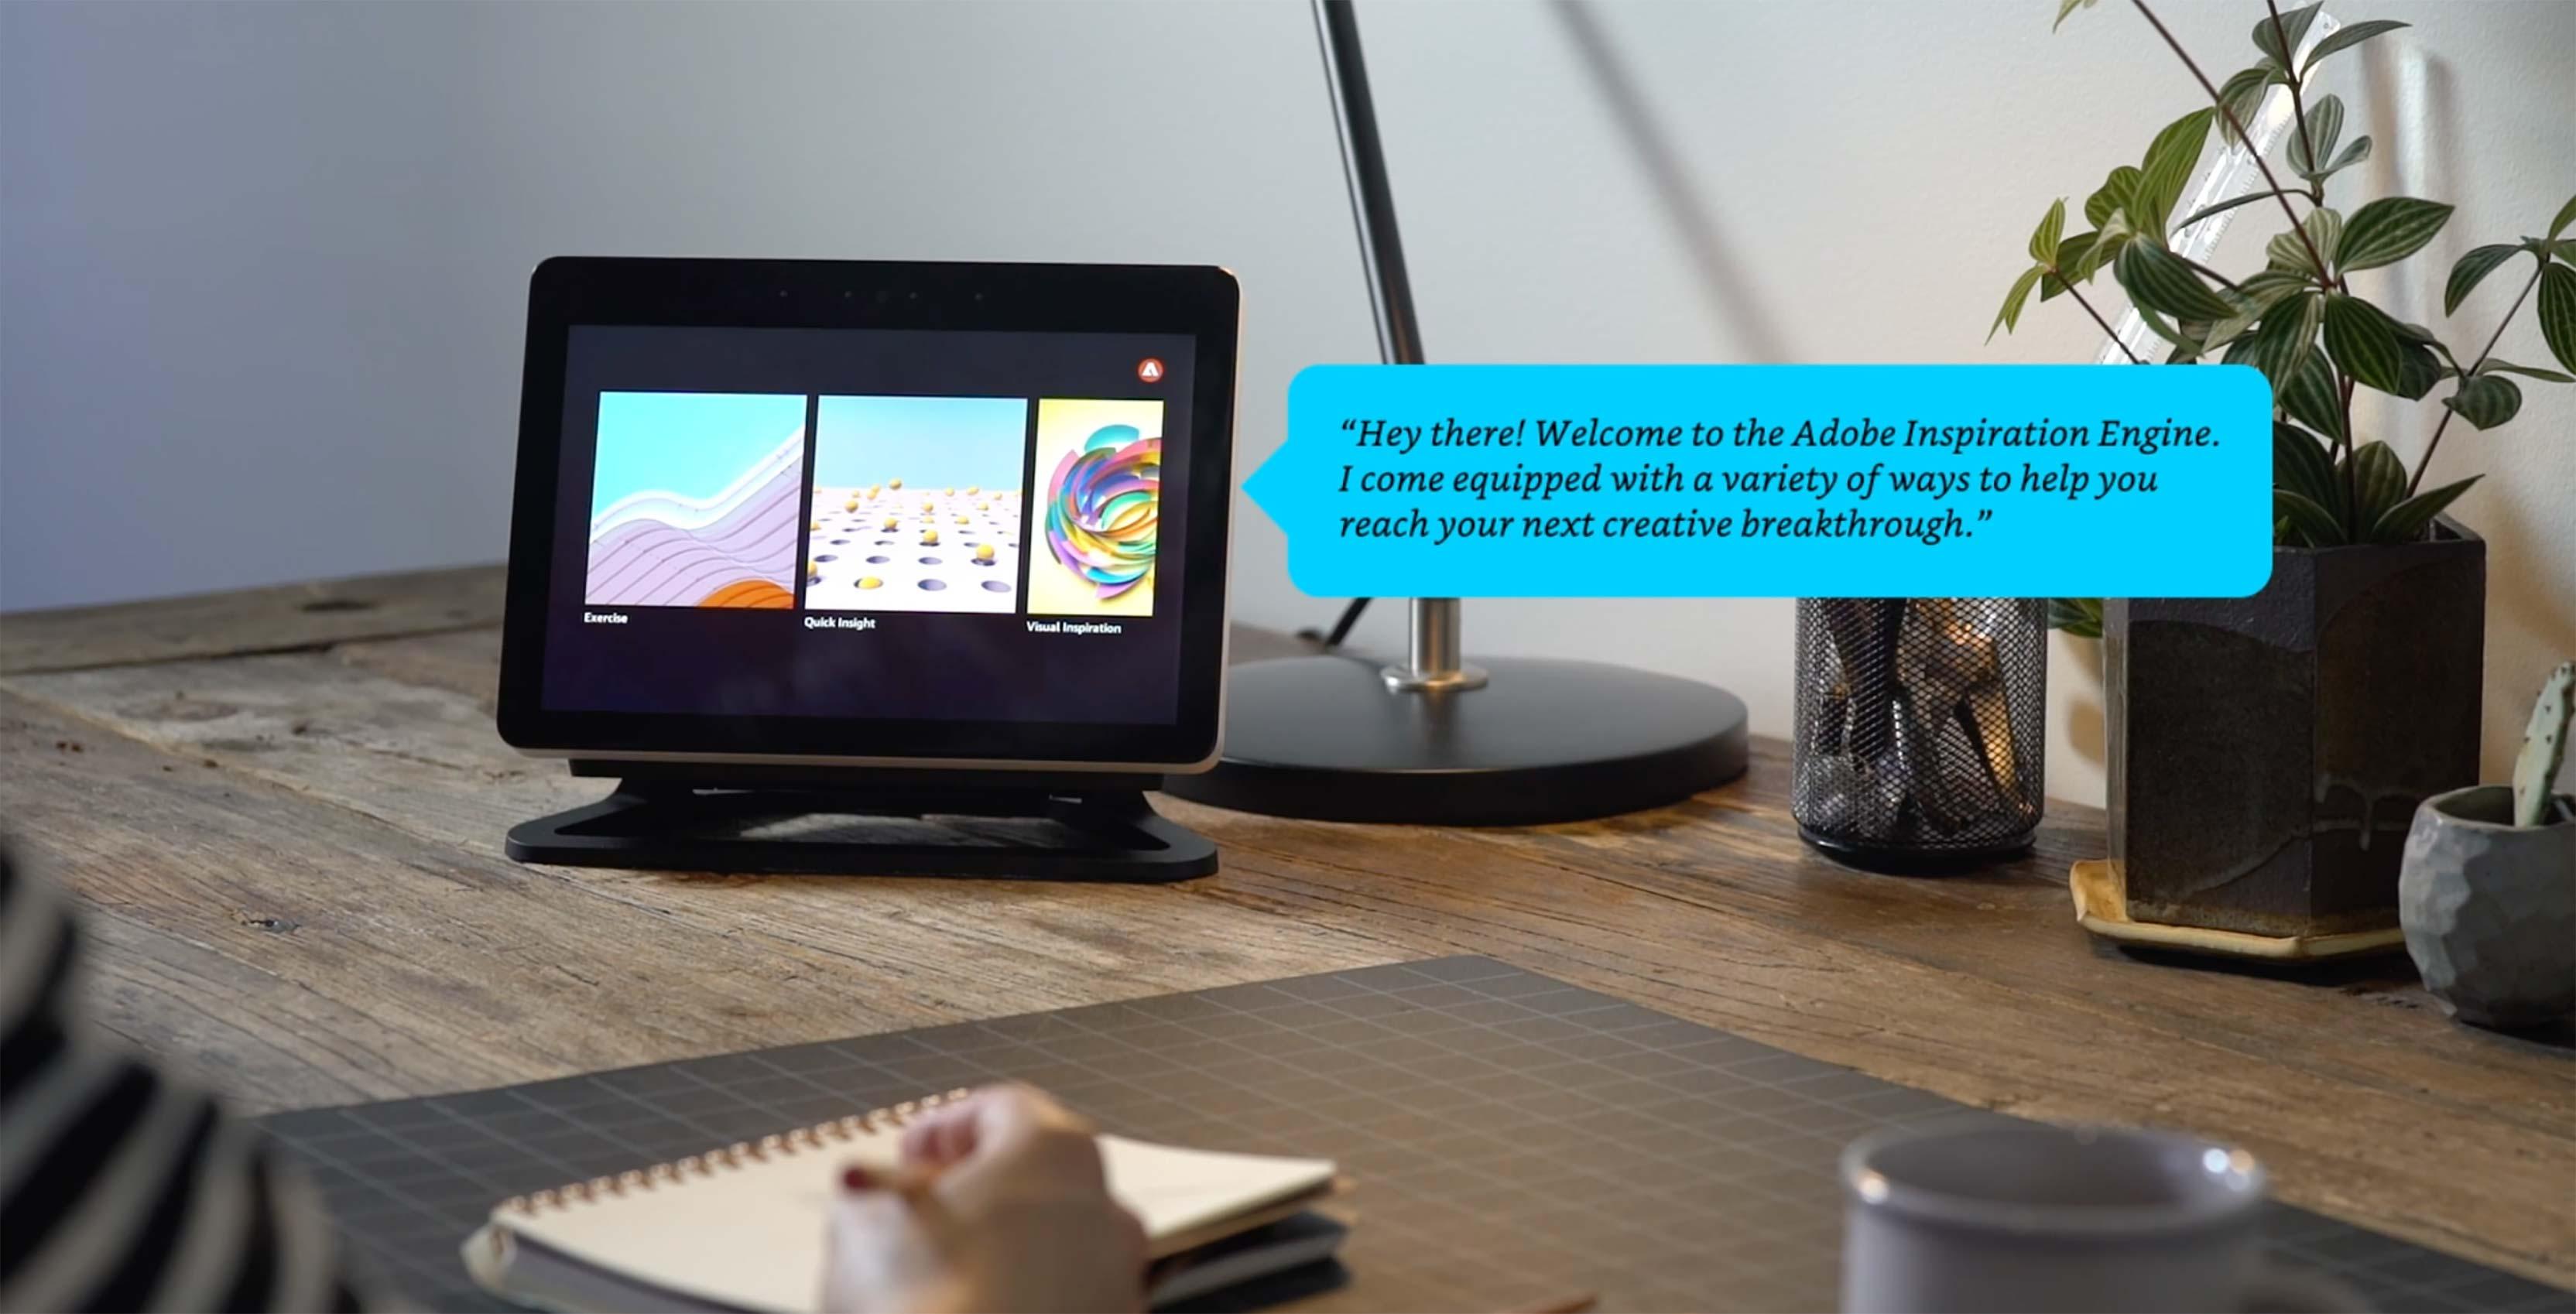 Adobe Inspiration Engine